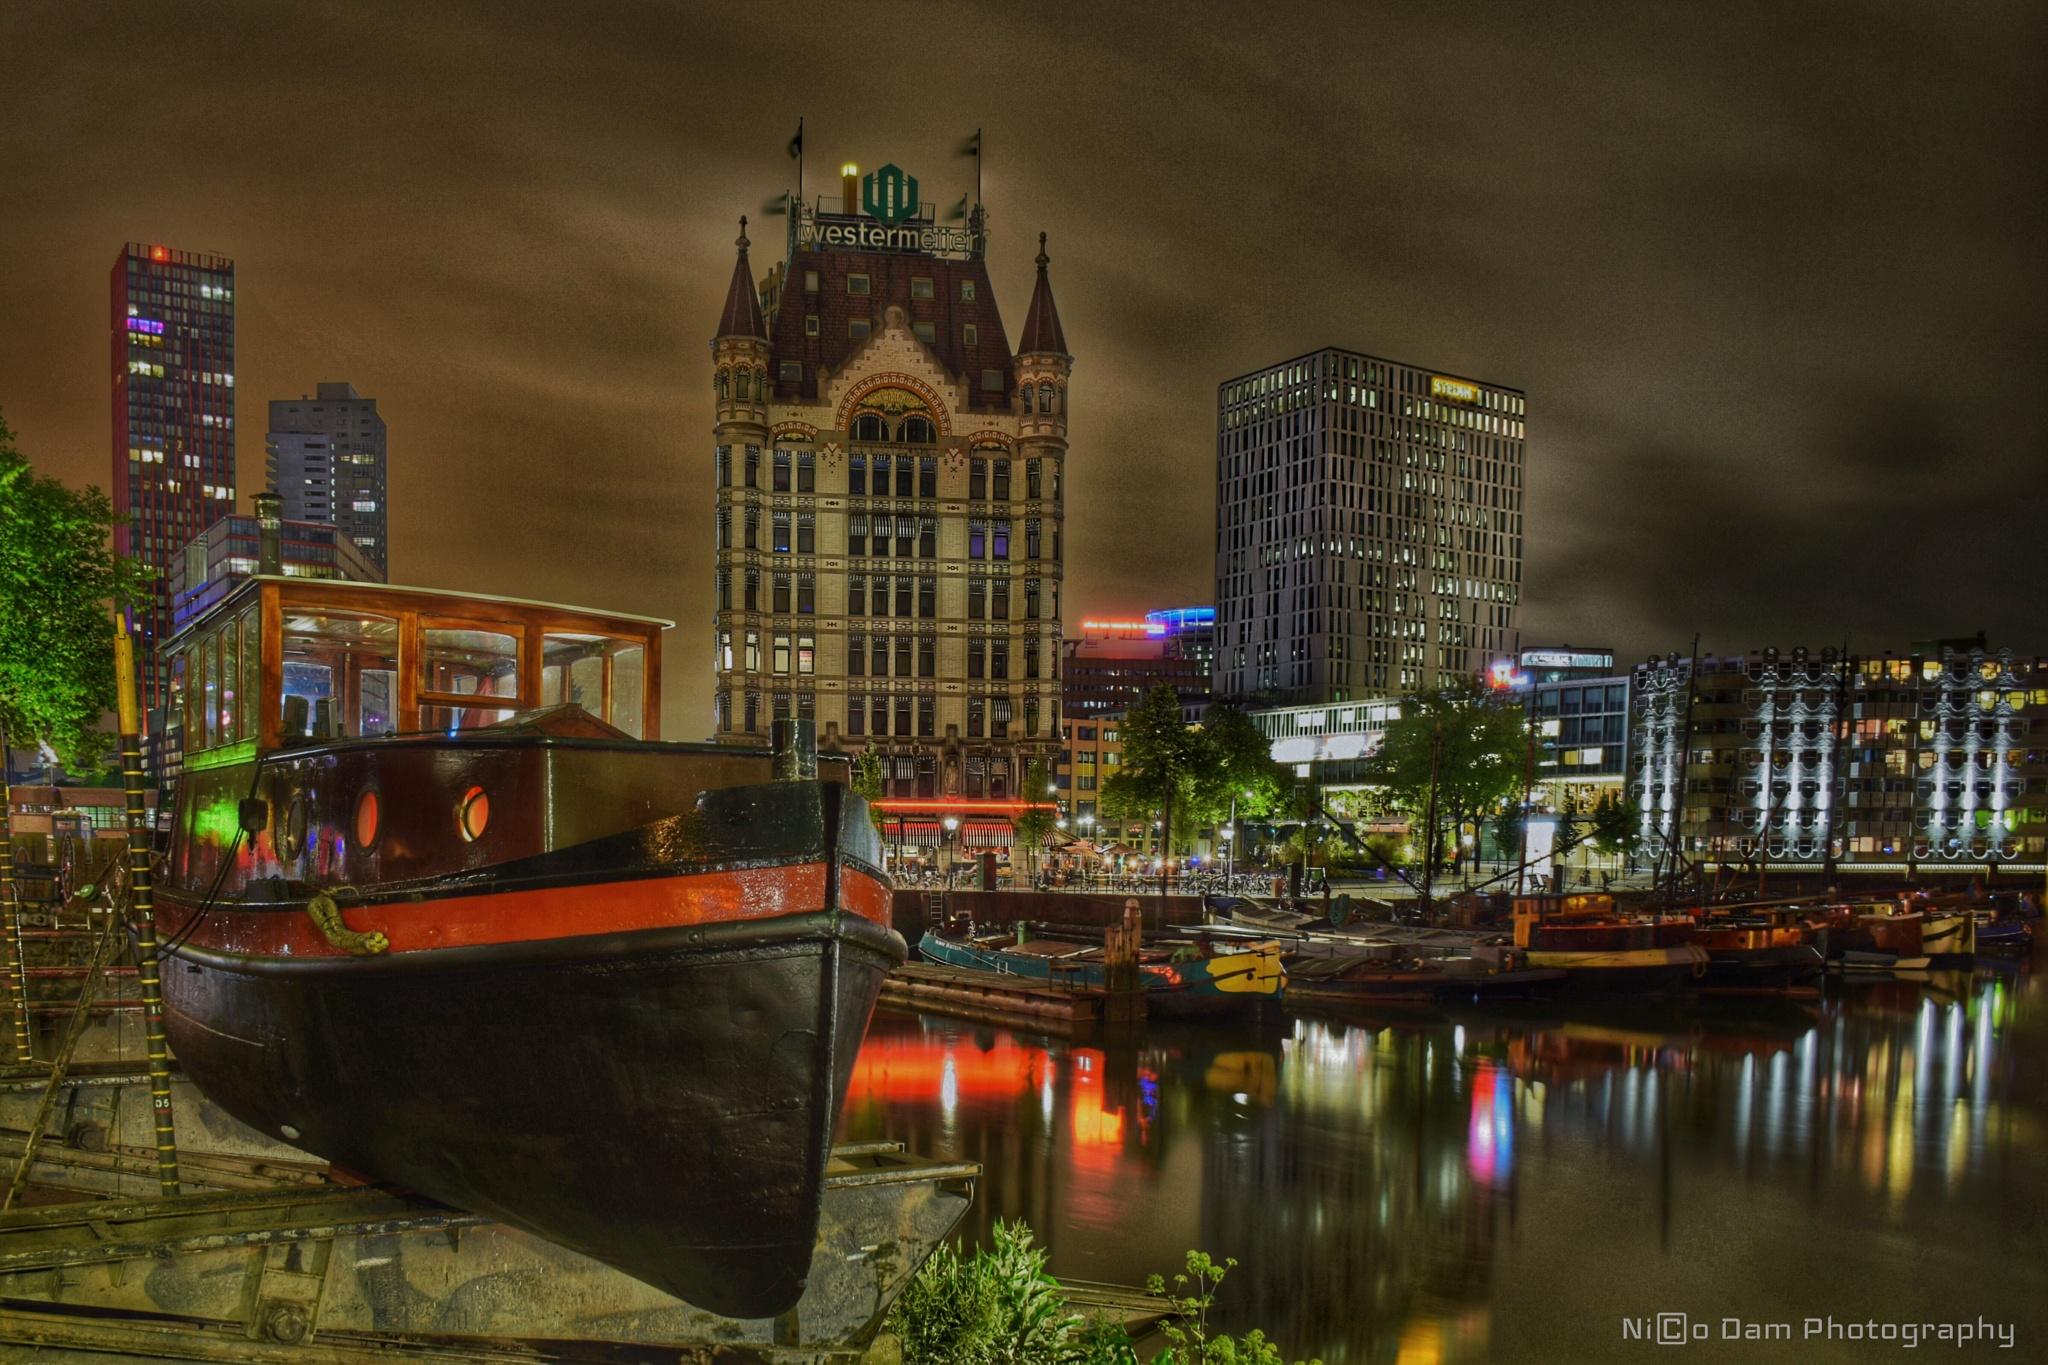 Old Wharf by Nico Dam